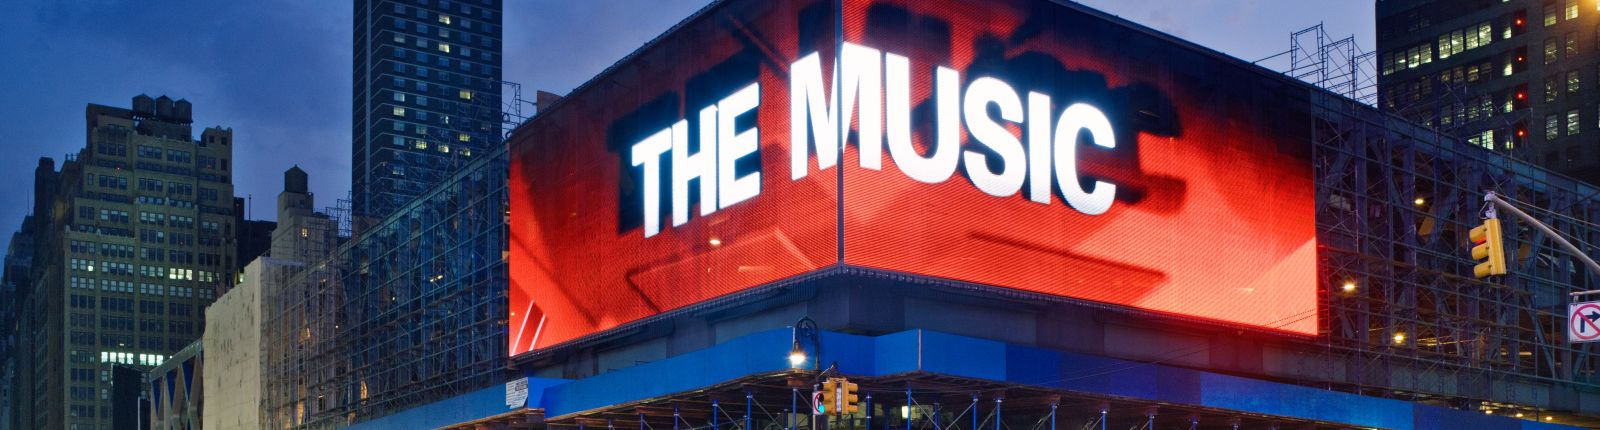 Transparent media façade highlights famous bus terminal in New York City